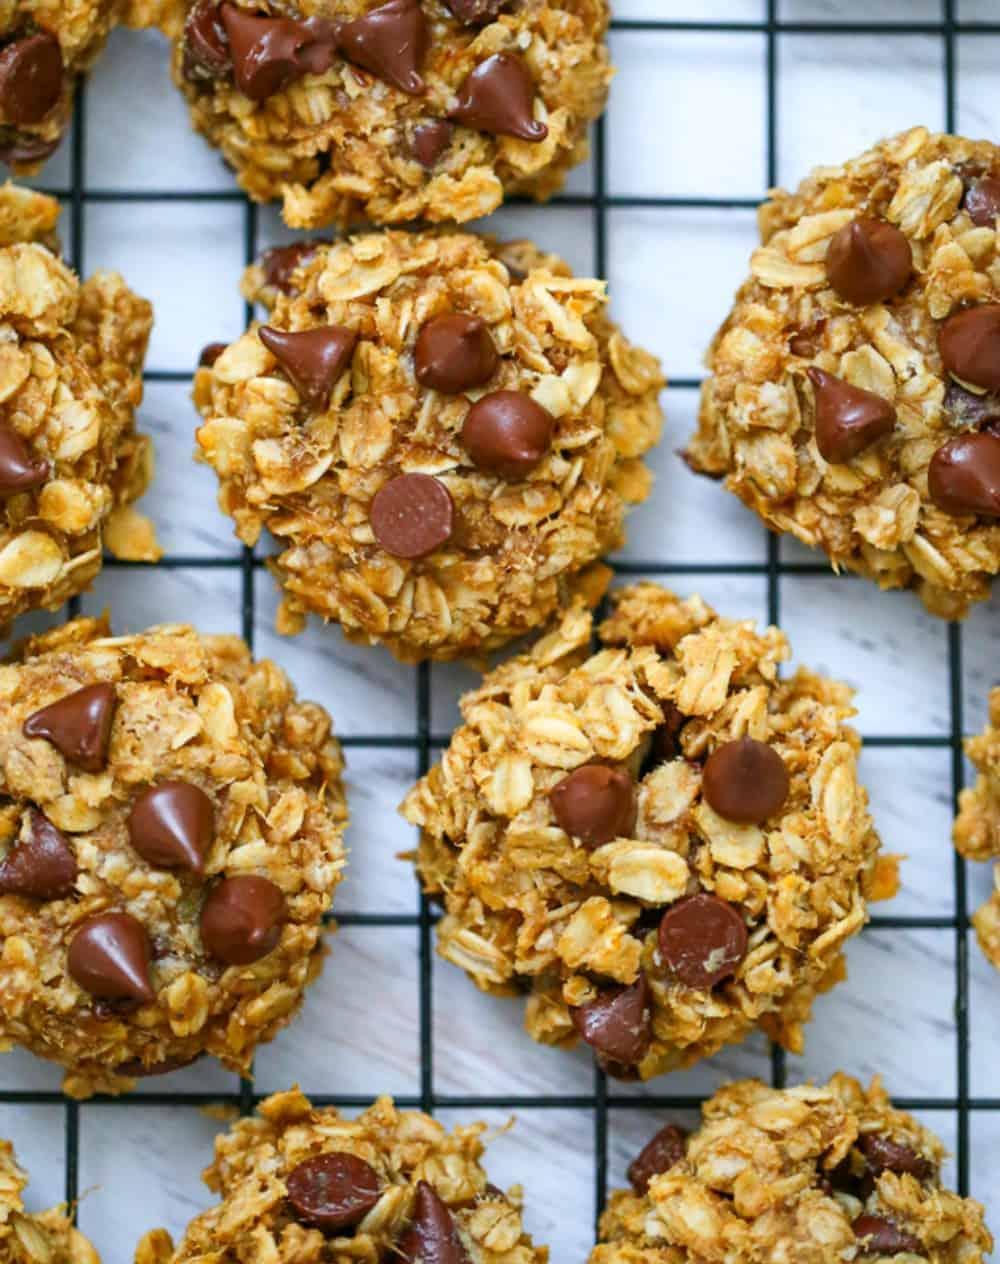 Flourless Peanut Butter Banana Oat Chocolate Chip Cookies - 5 Ingredients